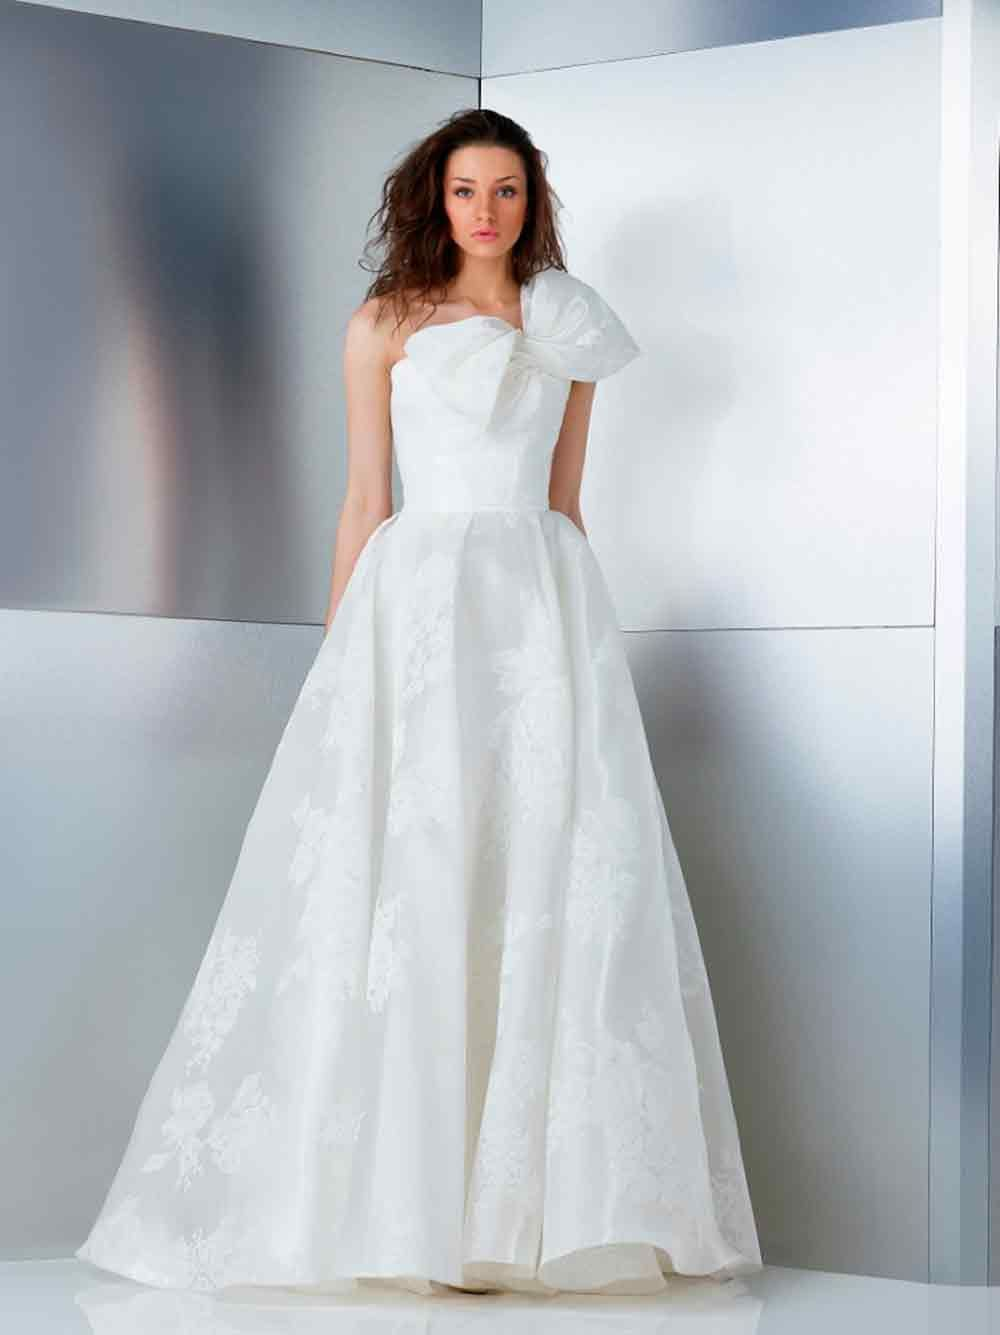 Stunning wedding dresses   Stunning Wedding Dresses with Bow Detail  Wedding dress Wedding